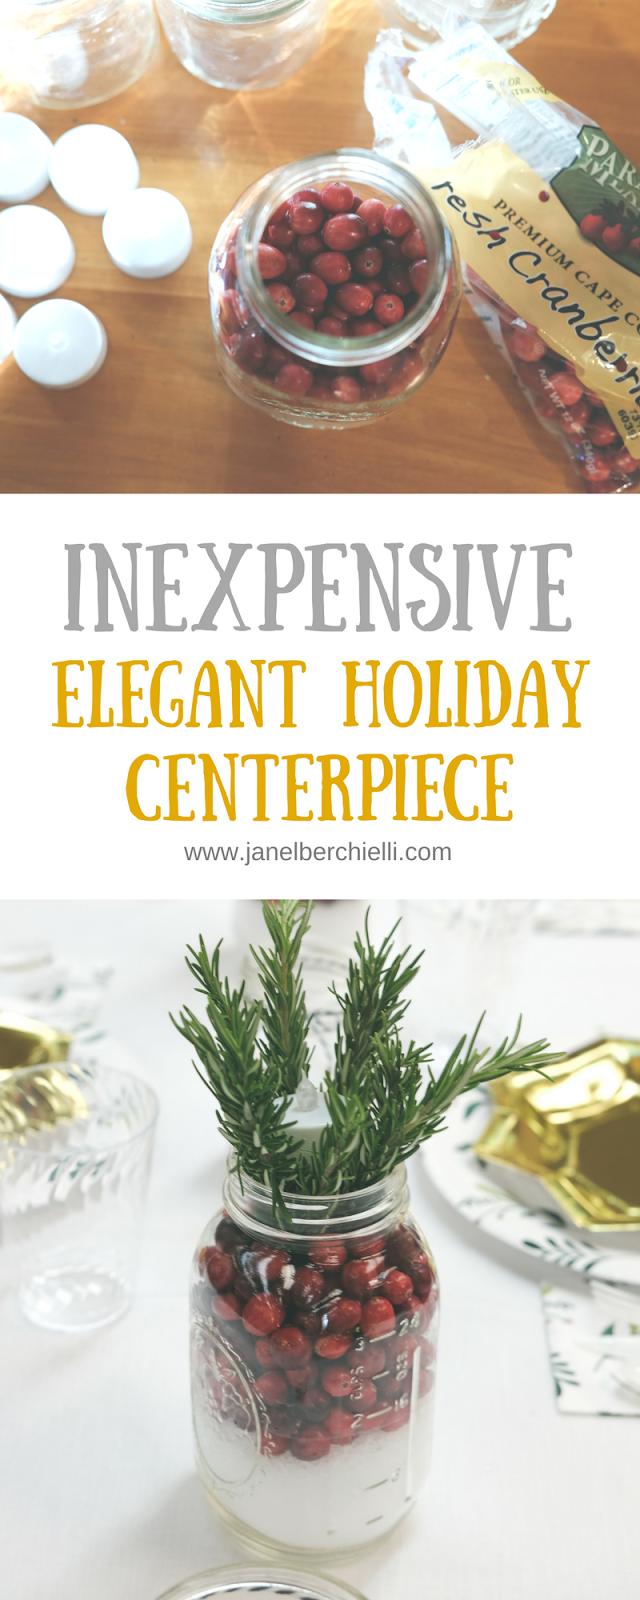 Inexpensive Elegant Holiday Centerpiece - Janel Berchielli